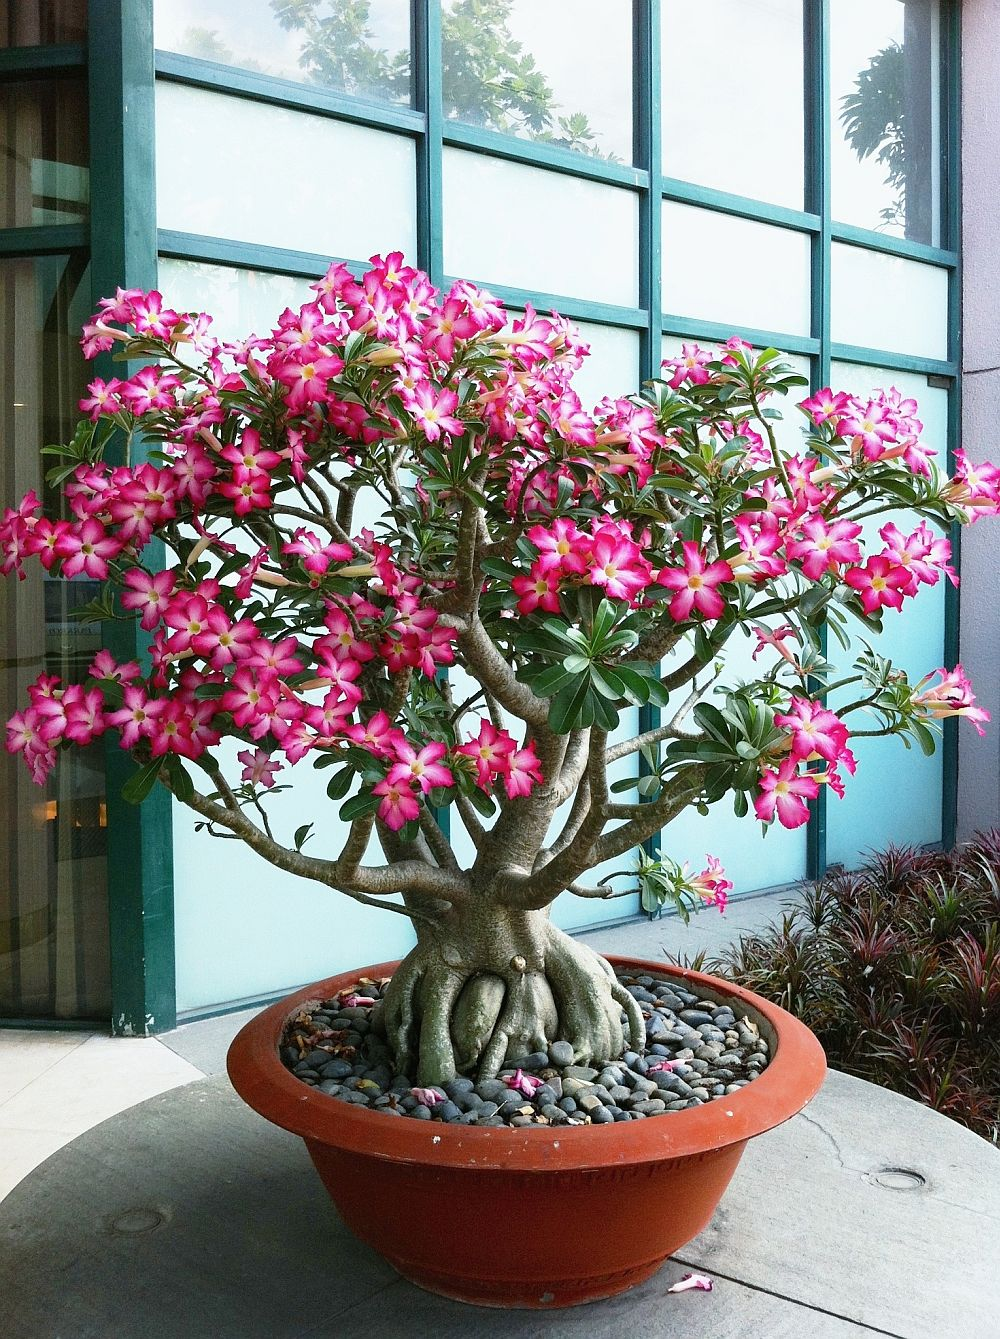 adelaparvu.com despre Adenium Obesum, Trandafirul desertului, Text Carli Marian  (1)